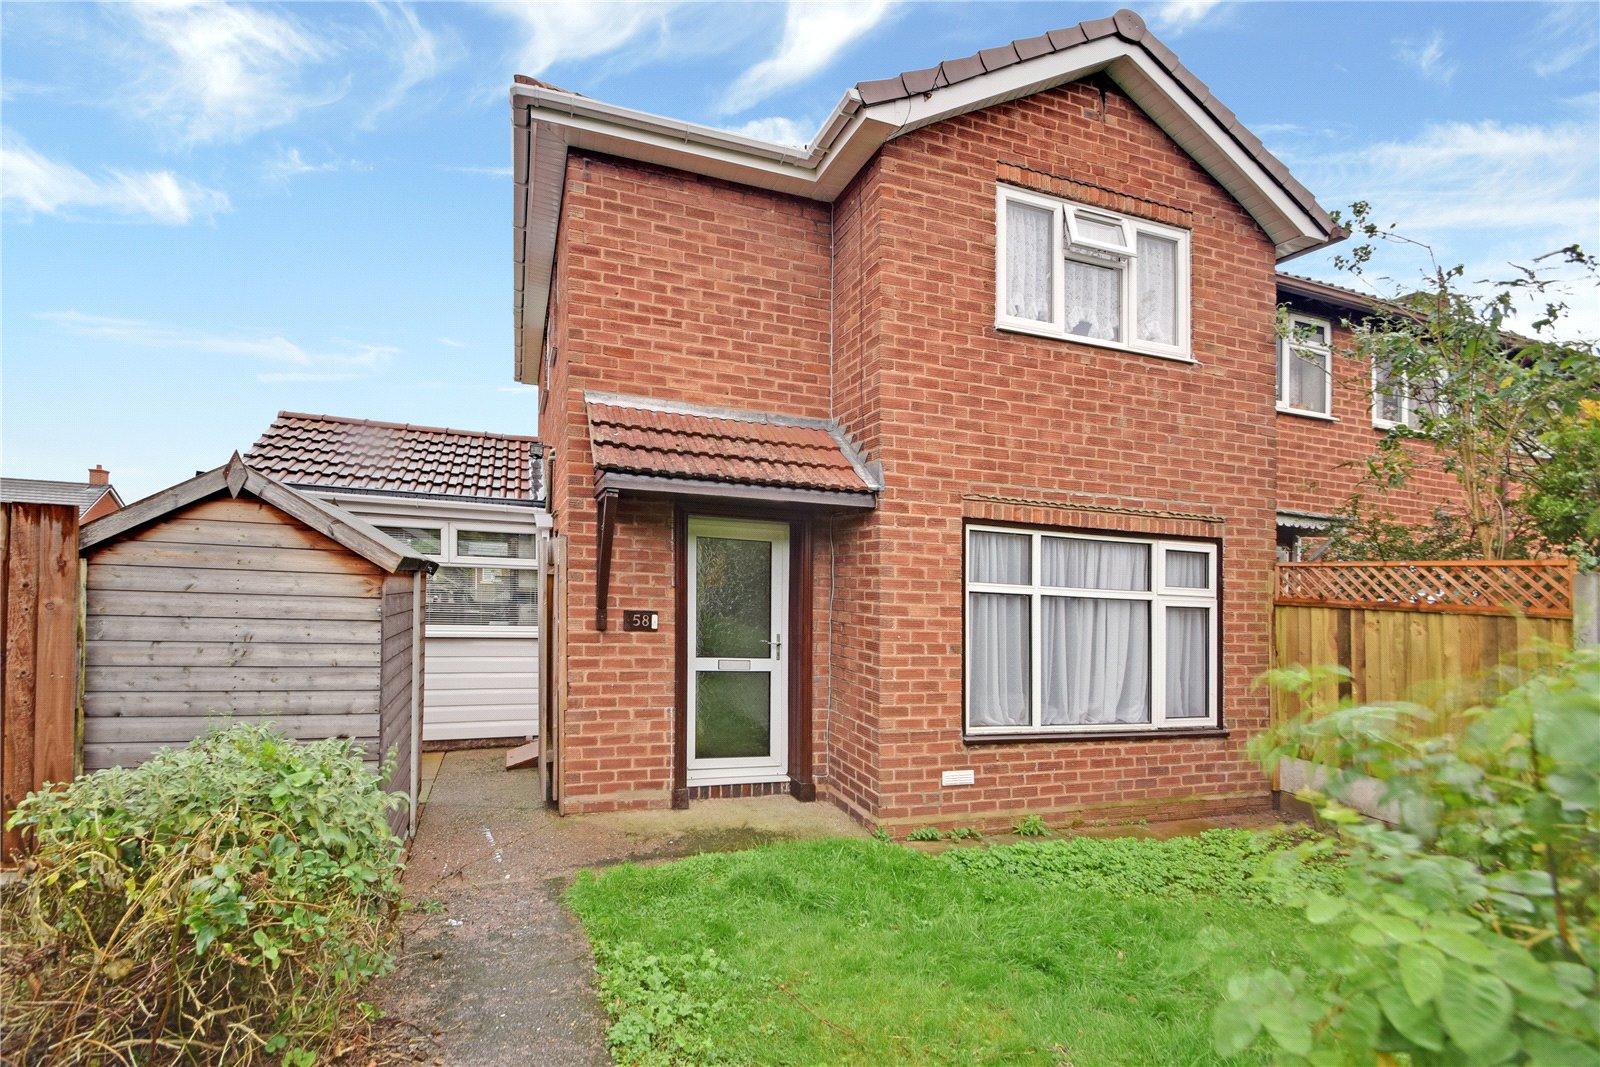 58 Rhea Hall Estate, Highley, Bridgnorth, Shropshire, WV16